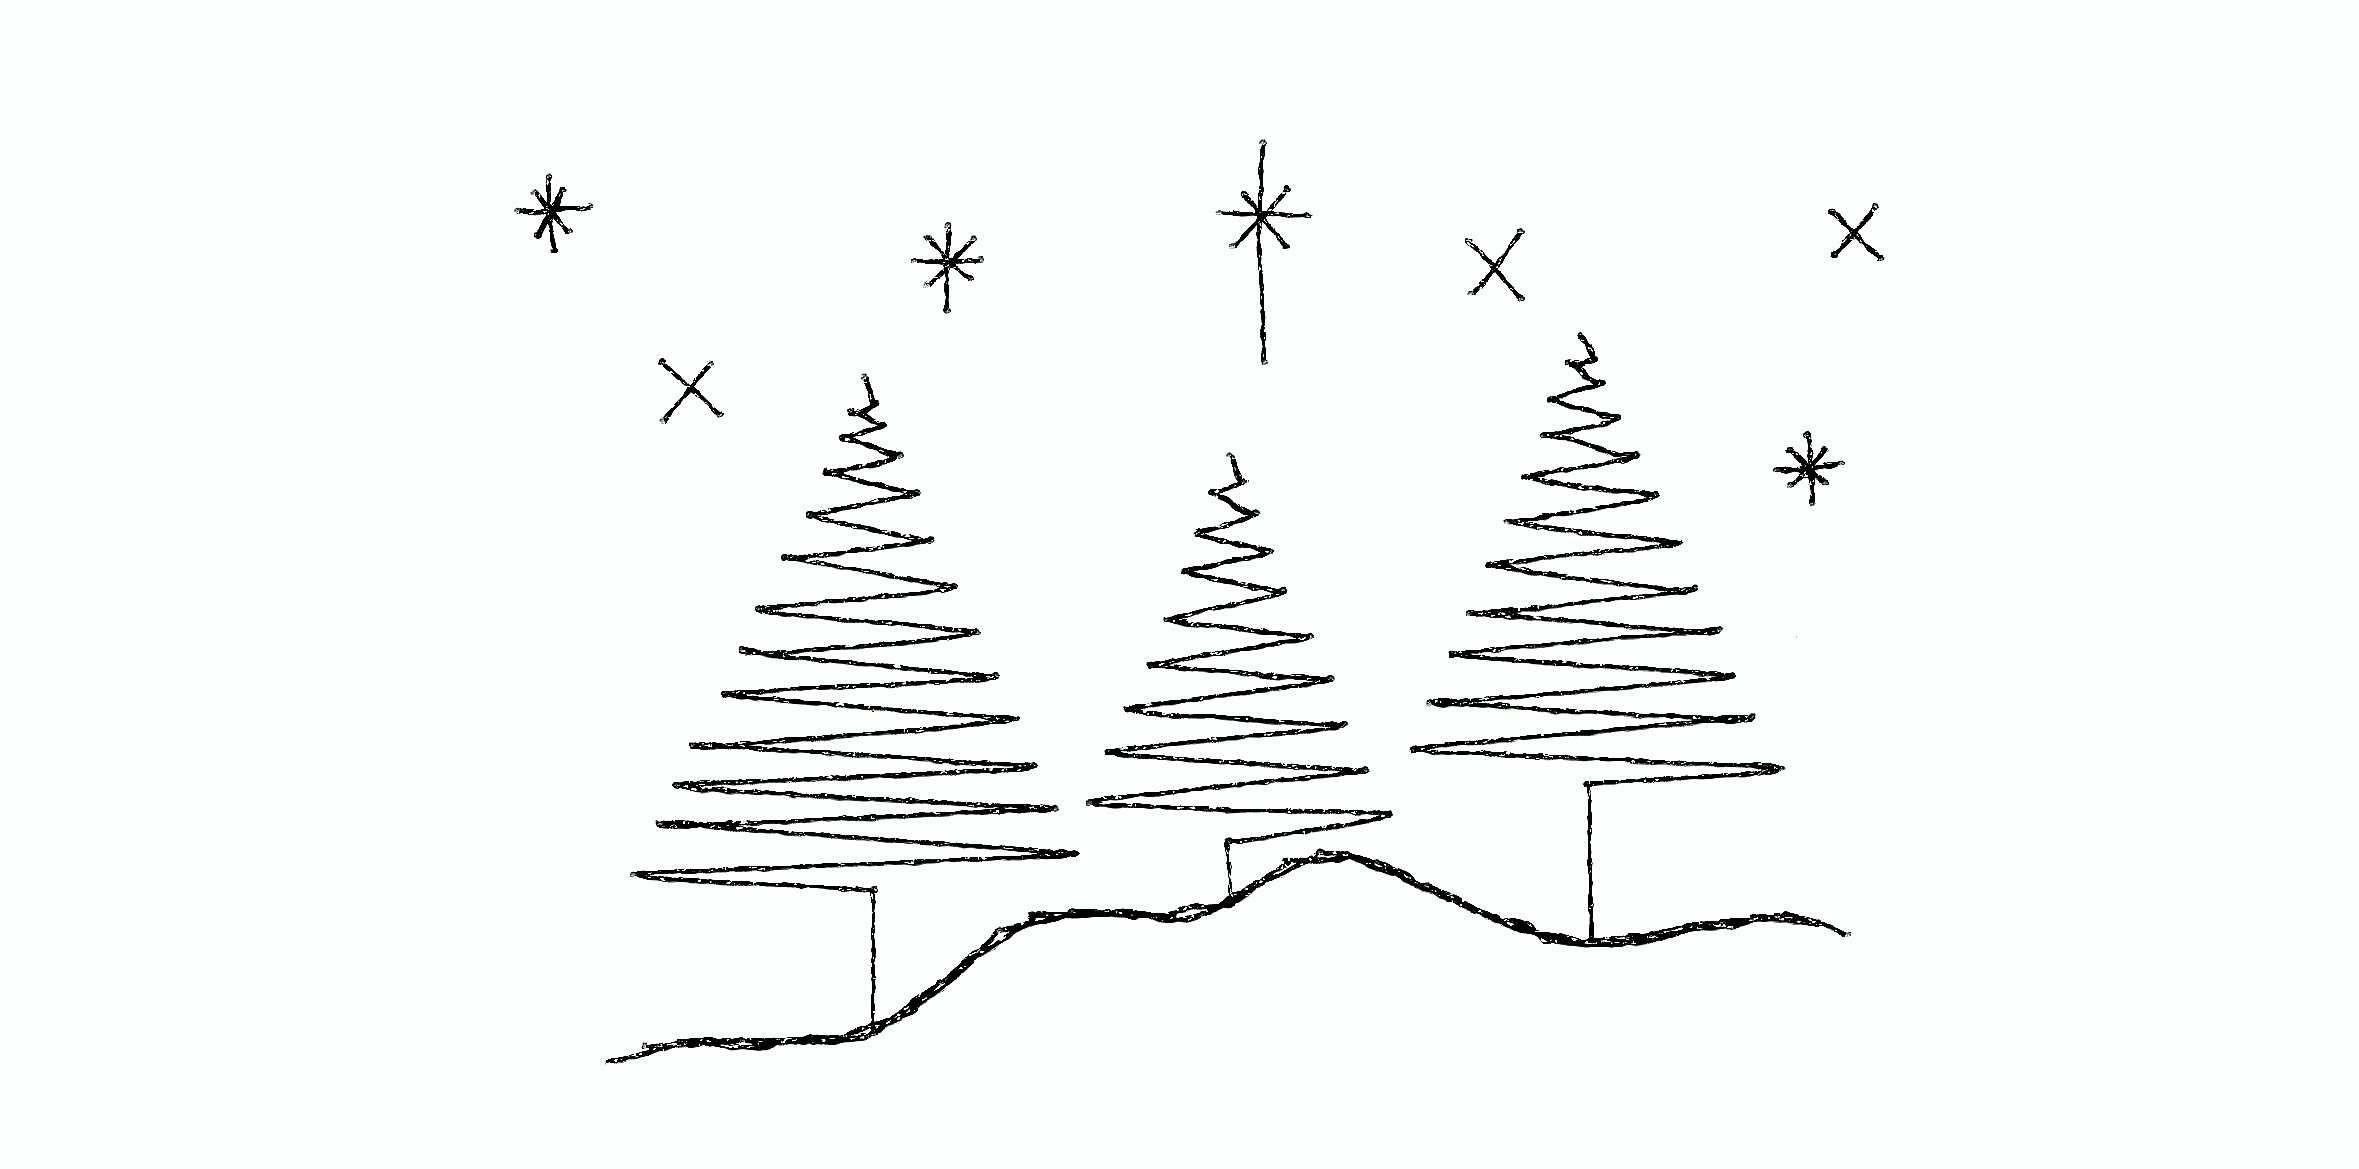 Haft Matematyczny Christmas Boze Narodzenie Christmas Card Art Paper Embroidery Embroidery And Stitching